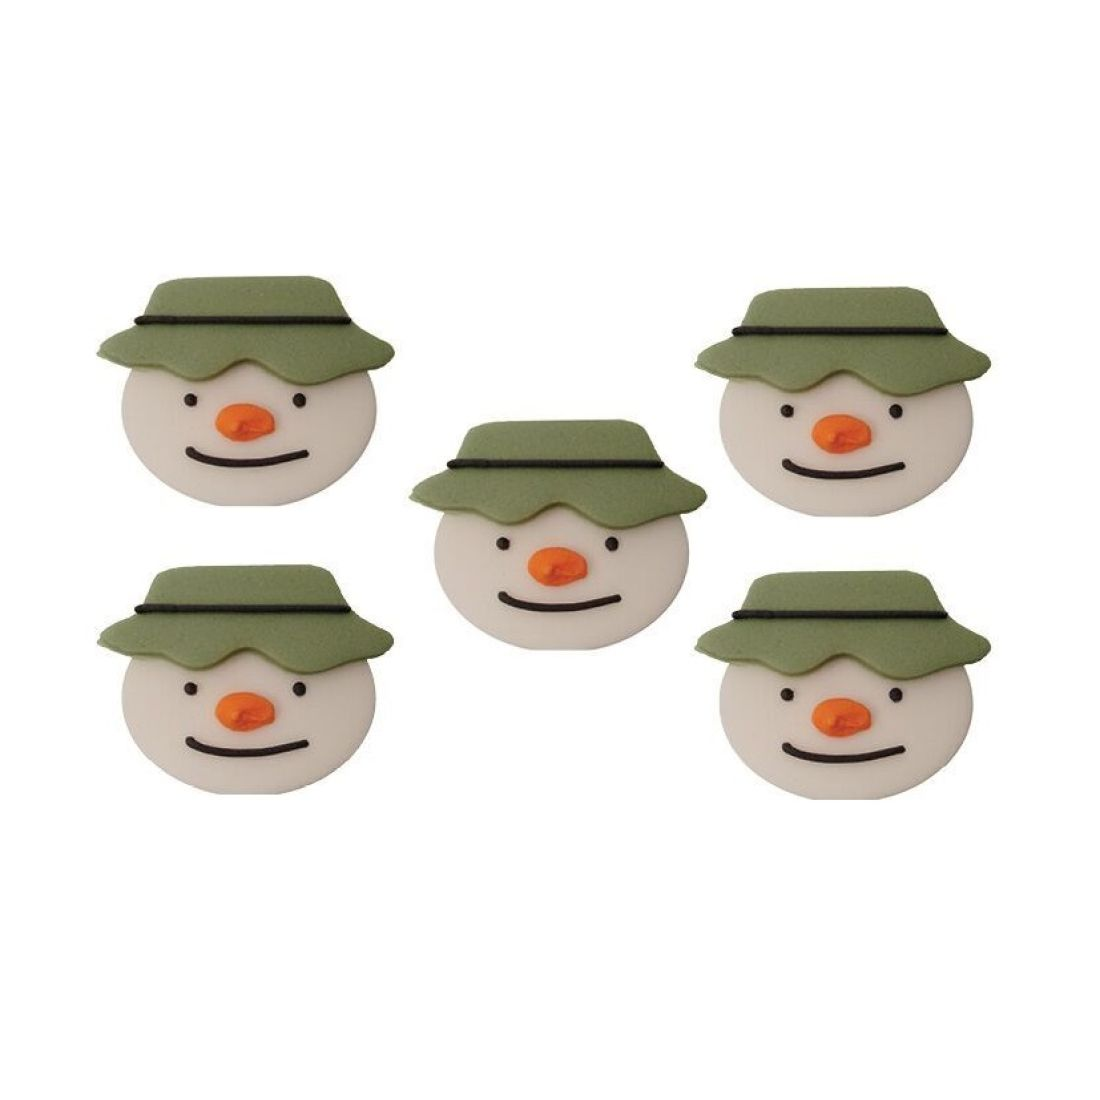 Raymond Briggs The Snowman Christmas Tree Decorations: Raymond Briggs Snowman Face Edible Decorations Set Of 5